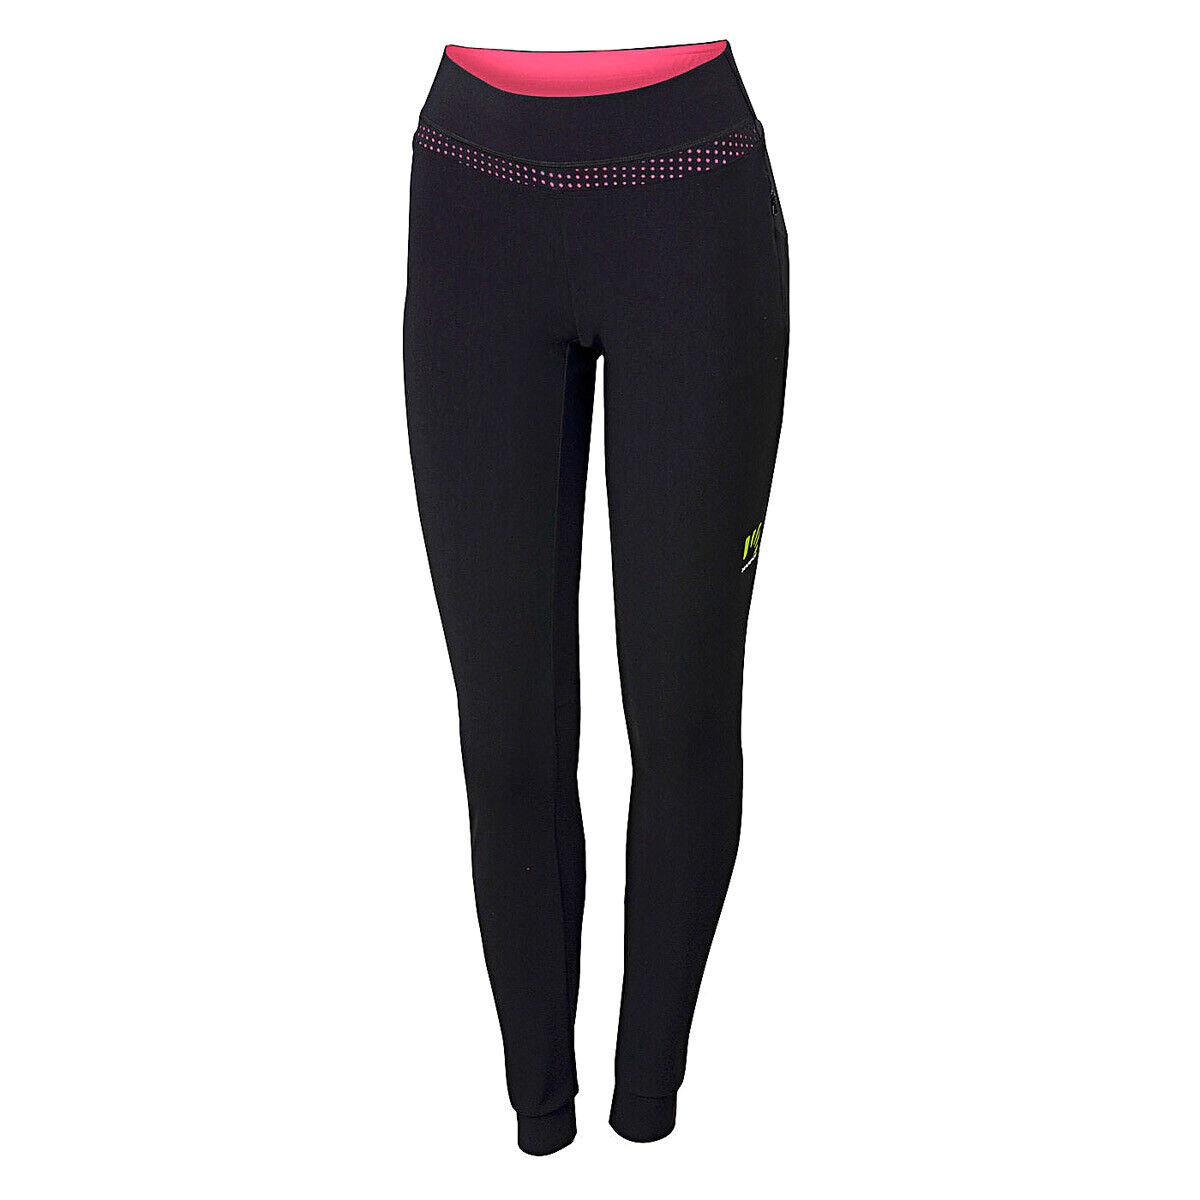 Karpos easygoing Pant W Pants  Sports Womens 2500833 102  best service